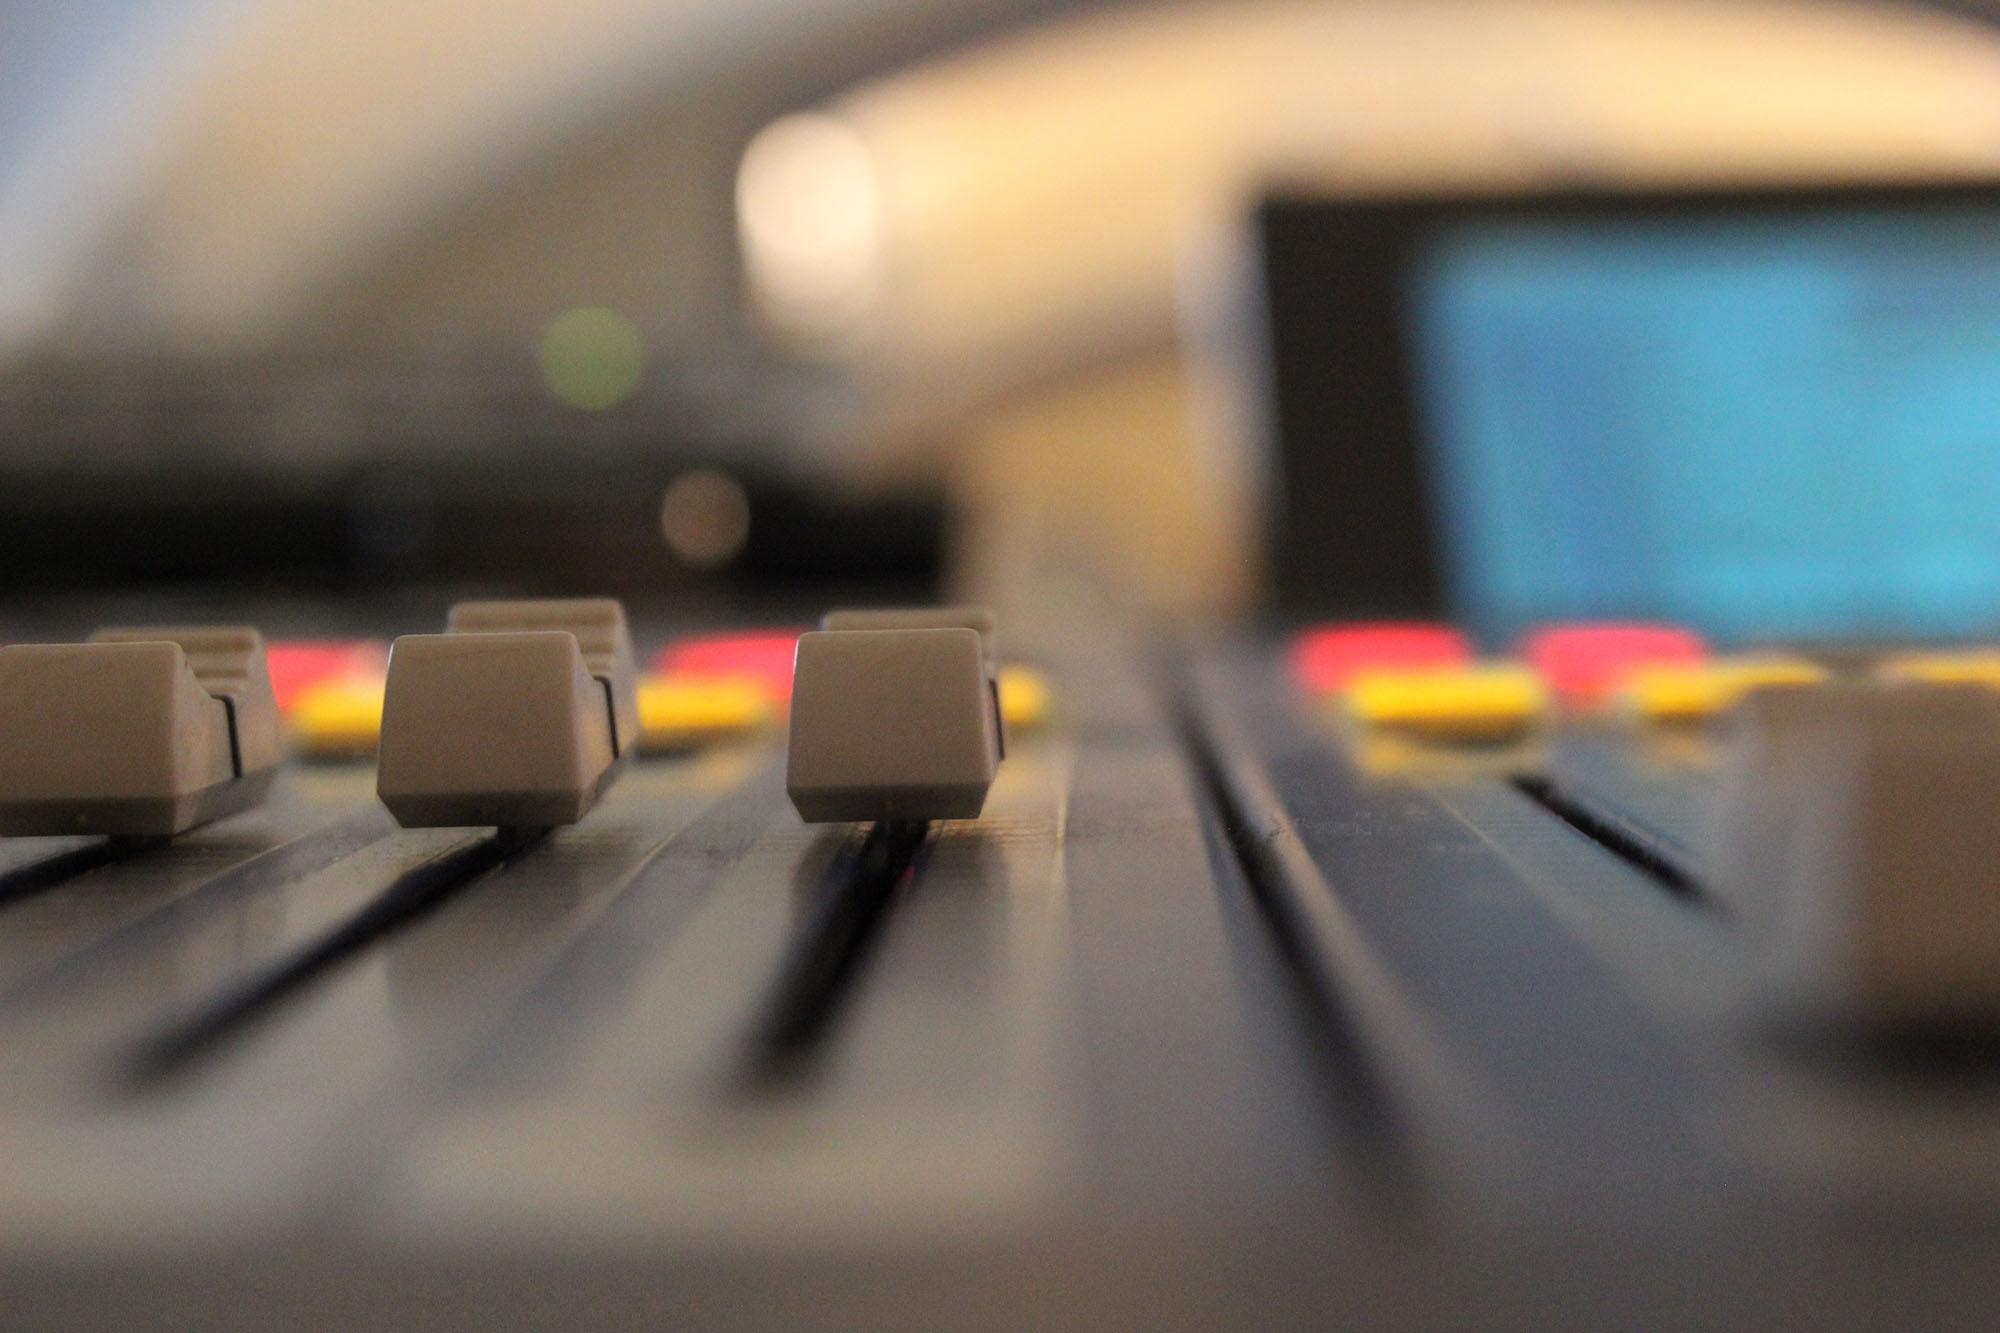 Studio d'enregistrement st-hyacinthe